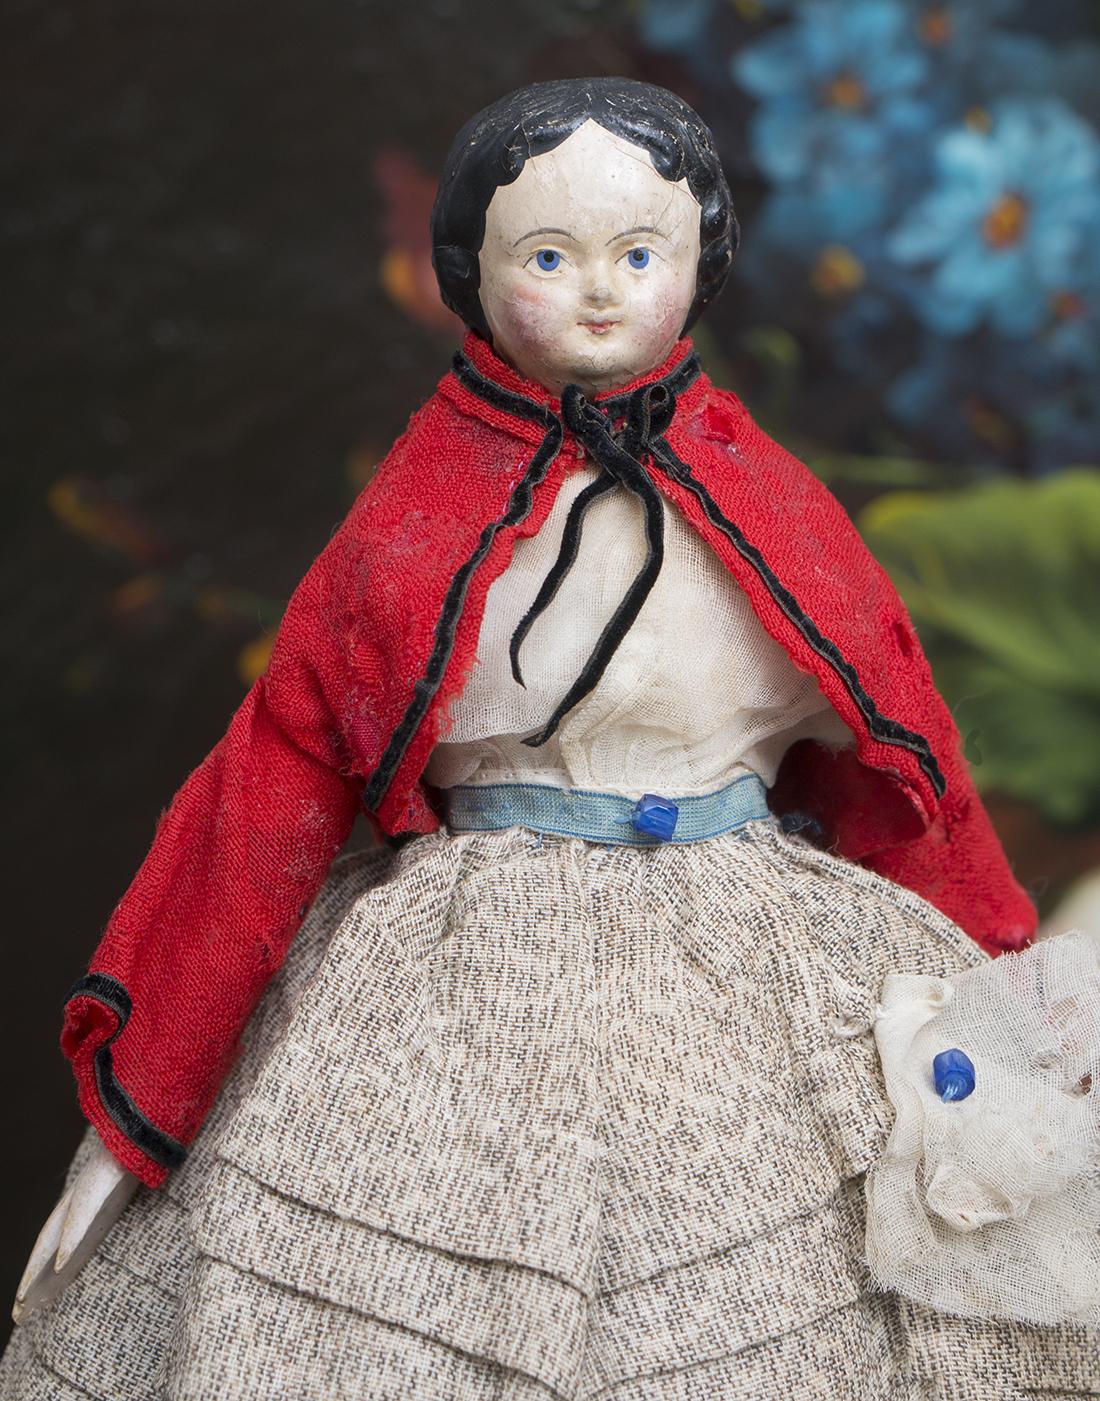 27см Кукла из папье-маше, 1840егоды